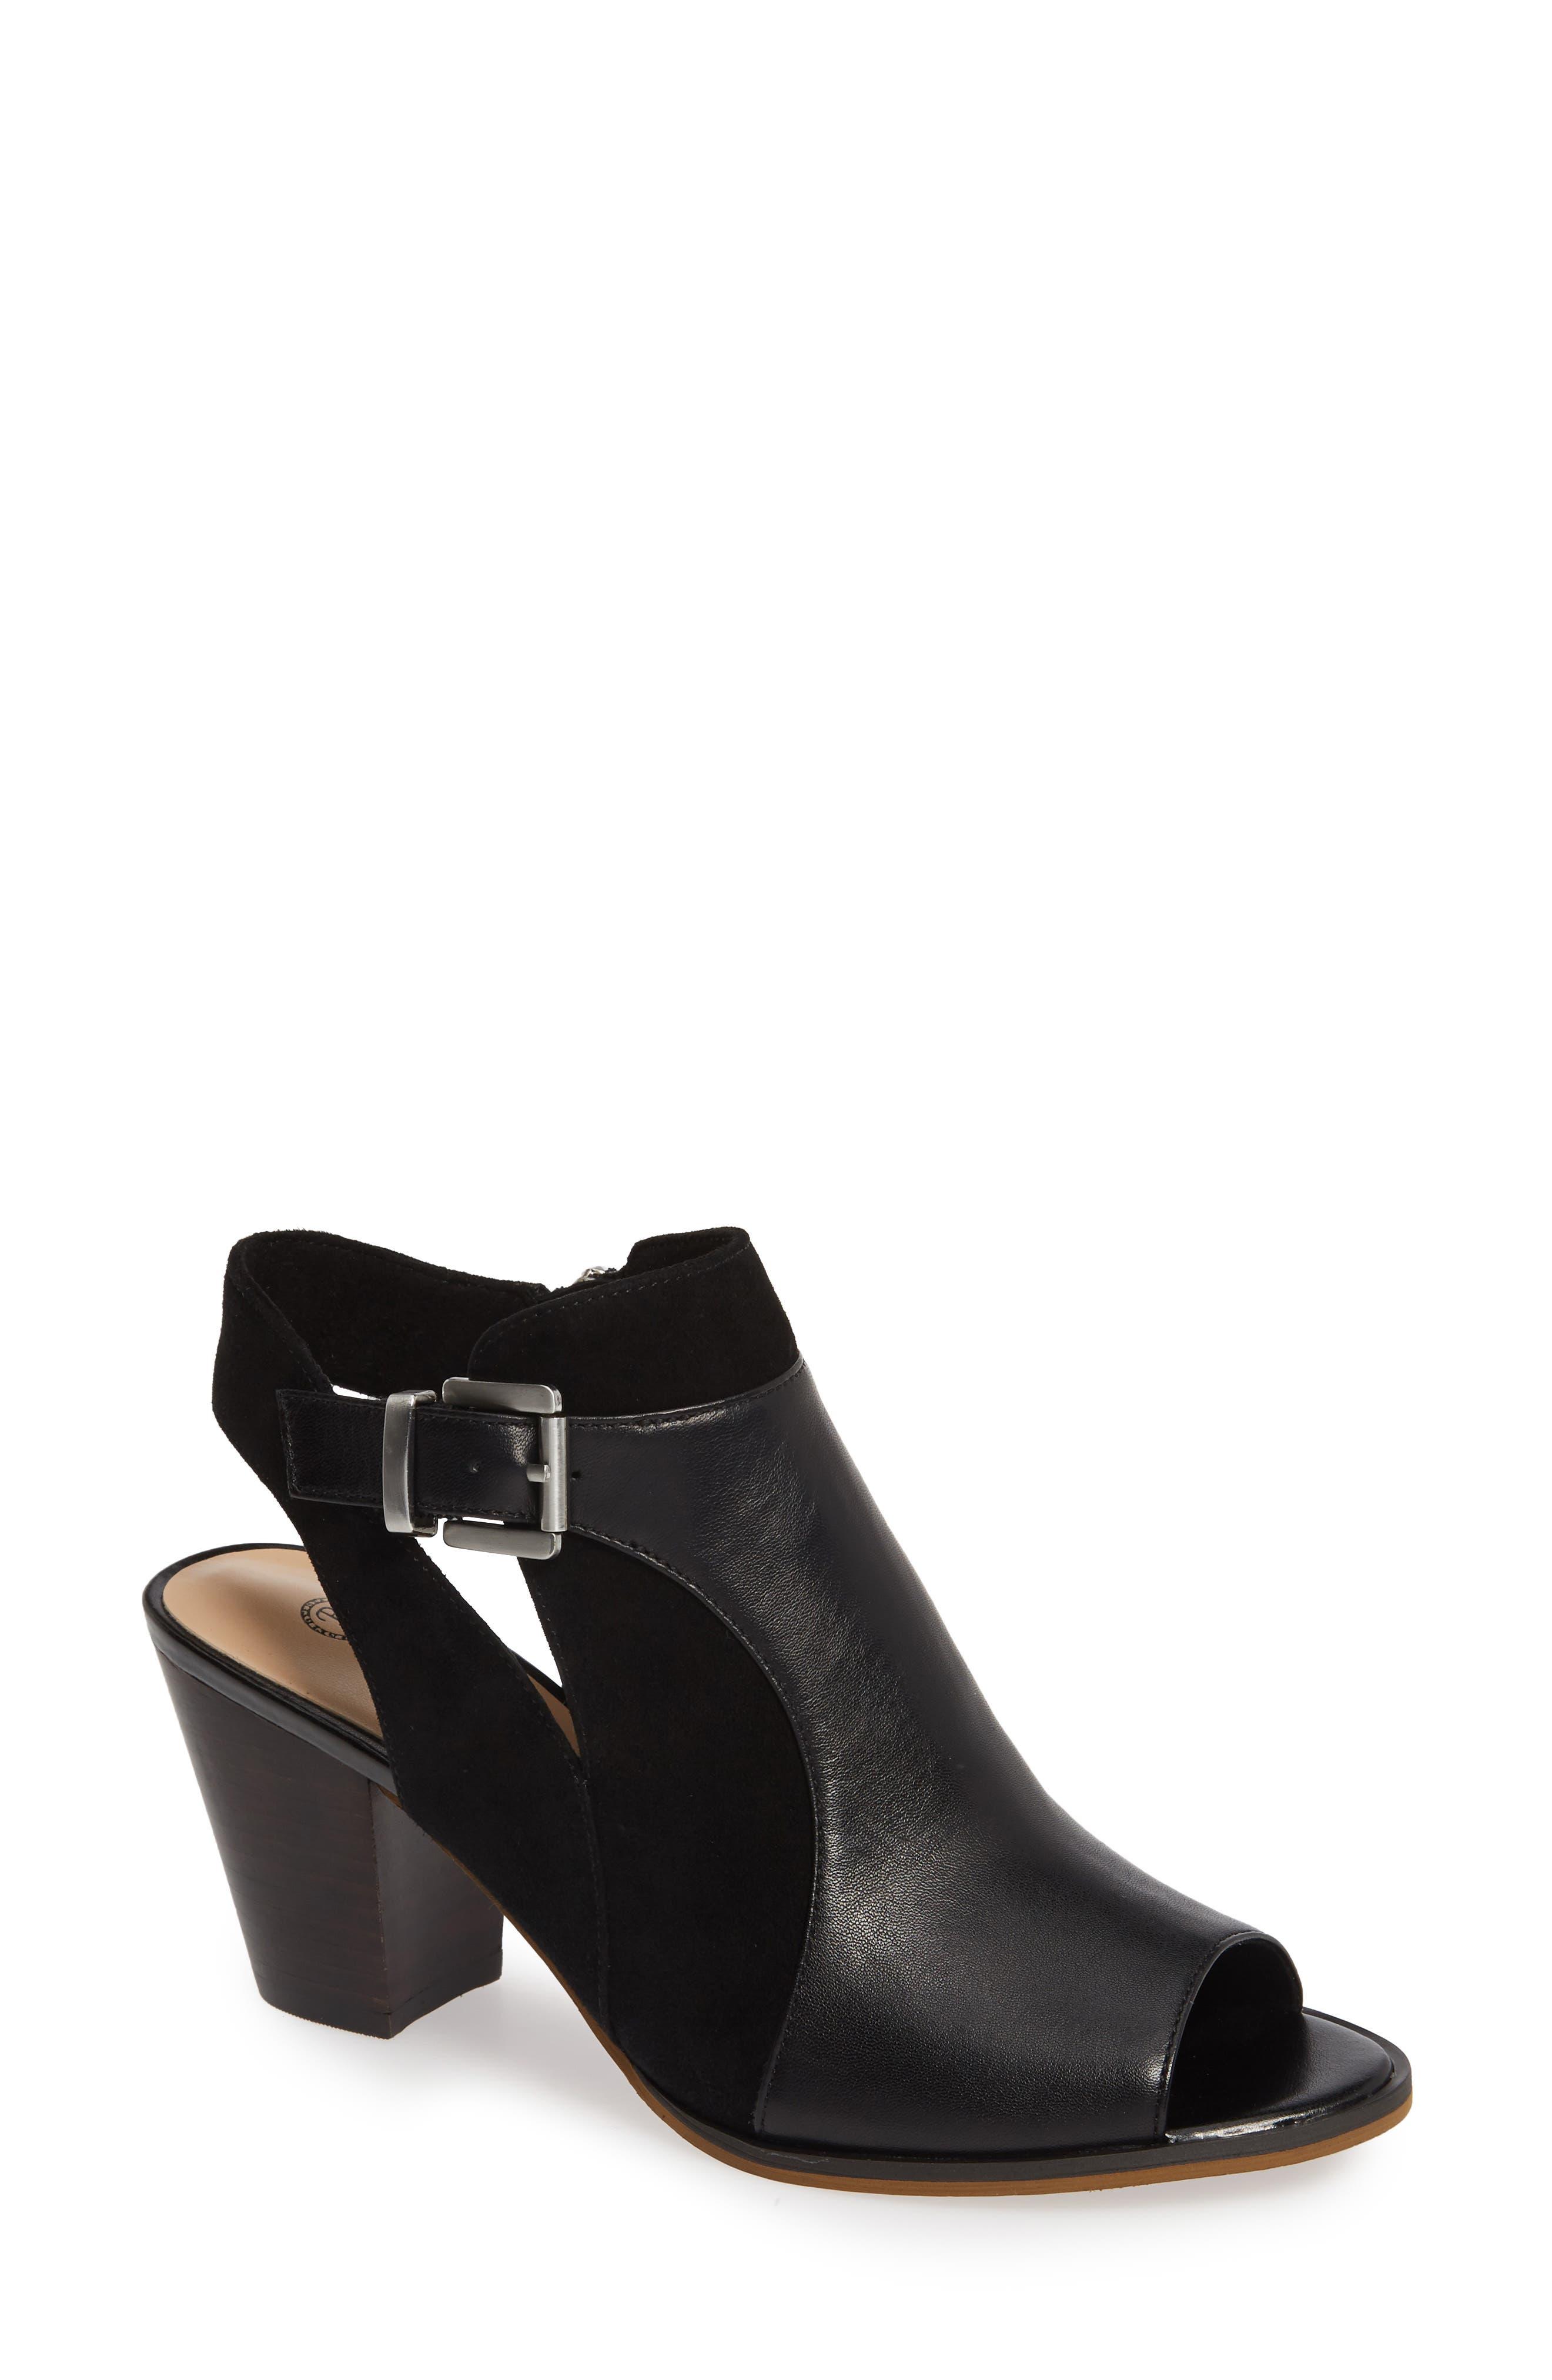 BELLA VITA, Kellan Mixed Finish Sandal, Main thumbnail 1, color, BLACK LEATHER/ SUEDE